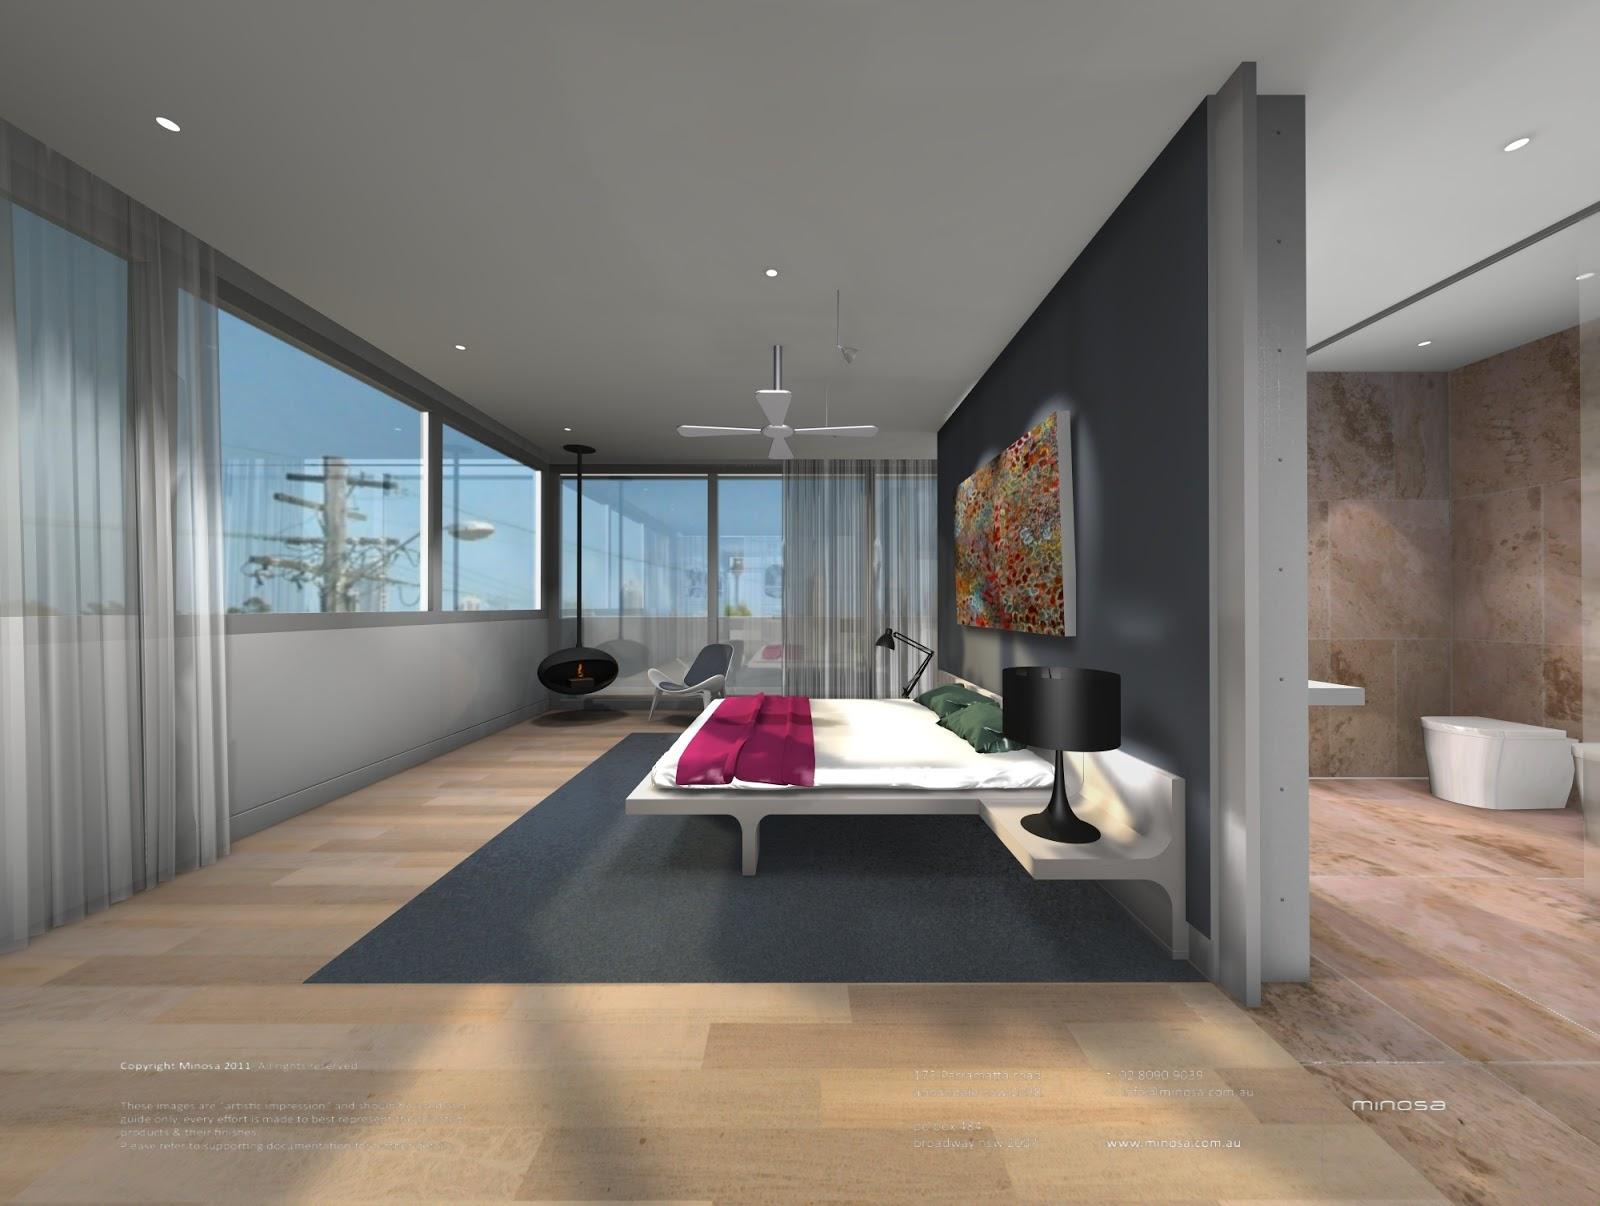 Minosa new minosa bathroom design resort style ensuite - New Minosa Bathroom Design Resort Style Ensuite